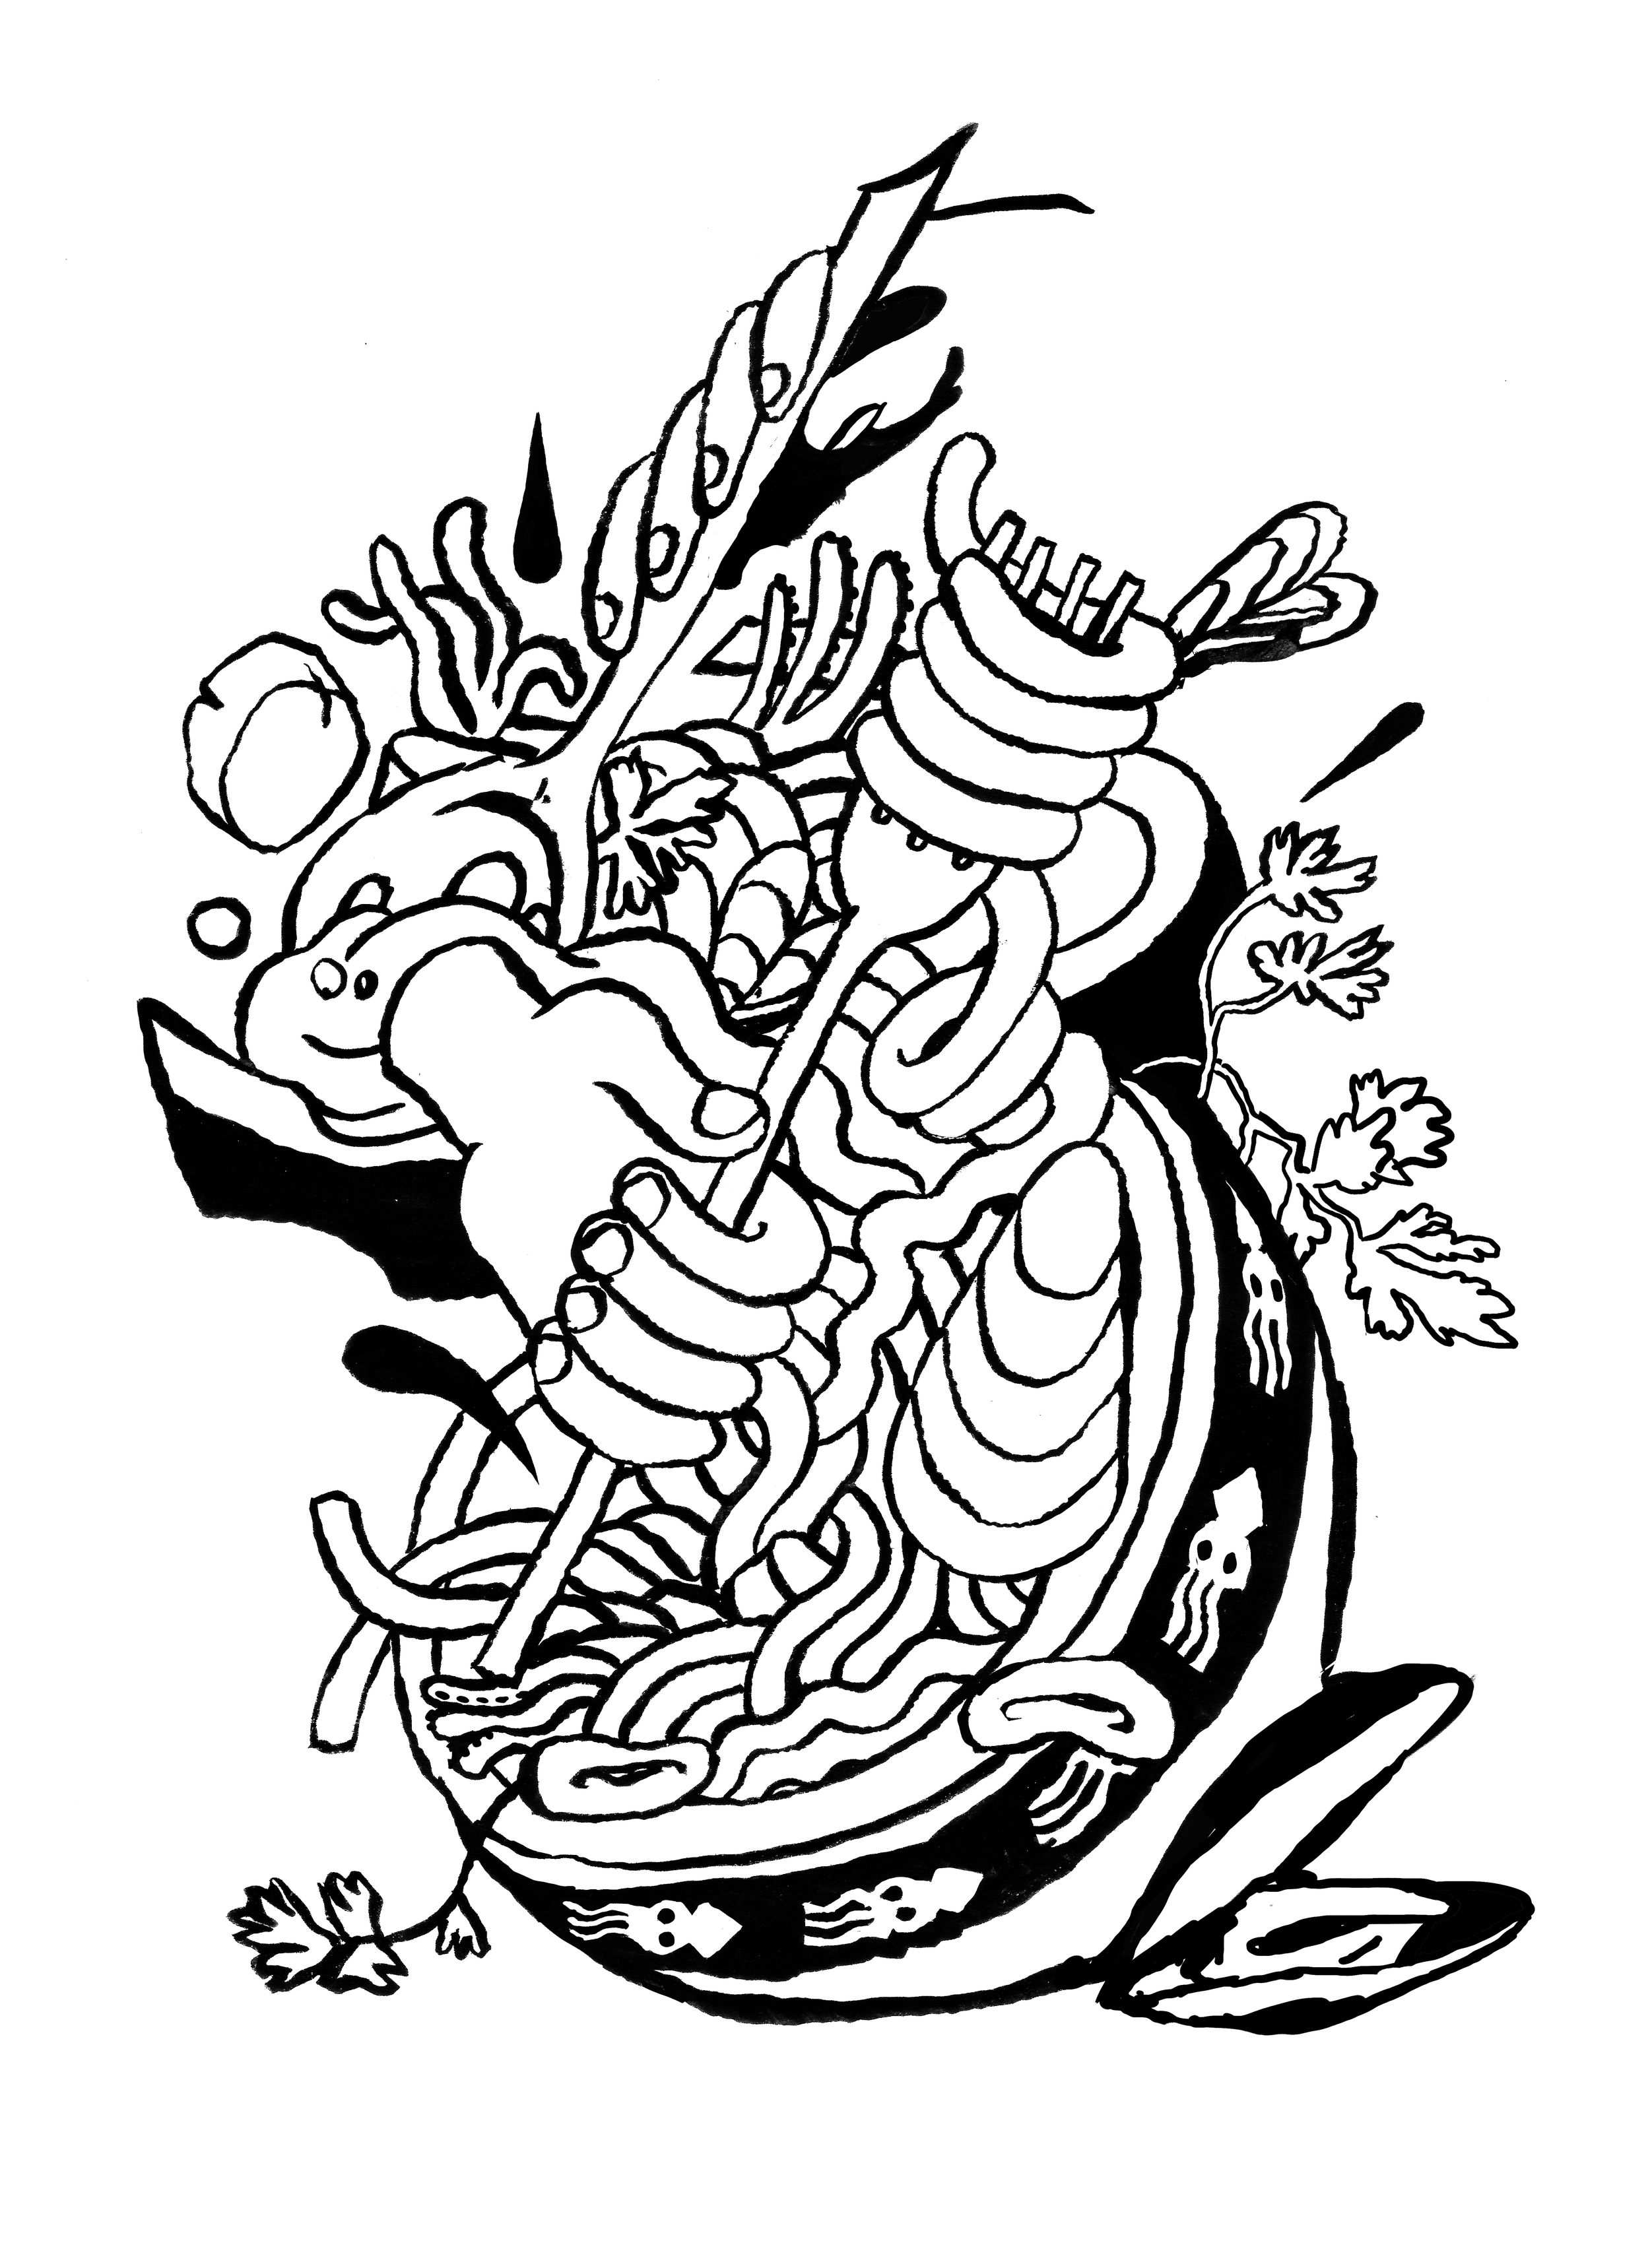 Black Squid Ink_8.5x11_pmf.jpg